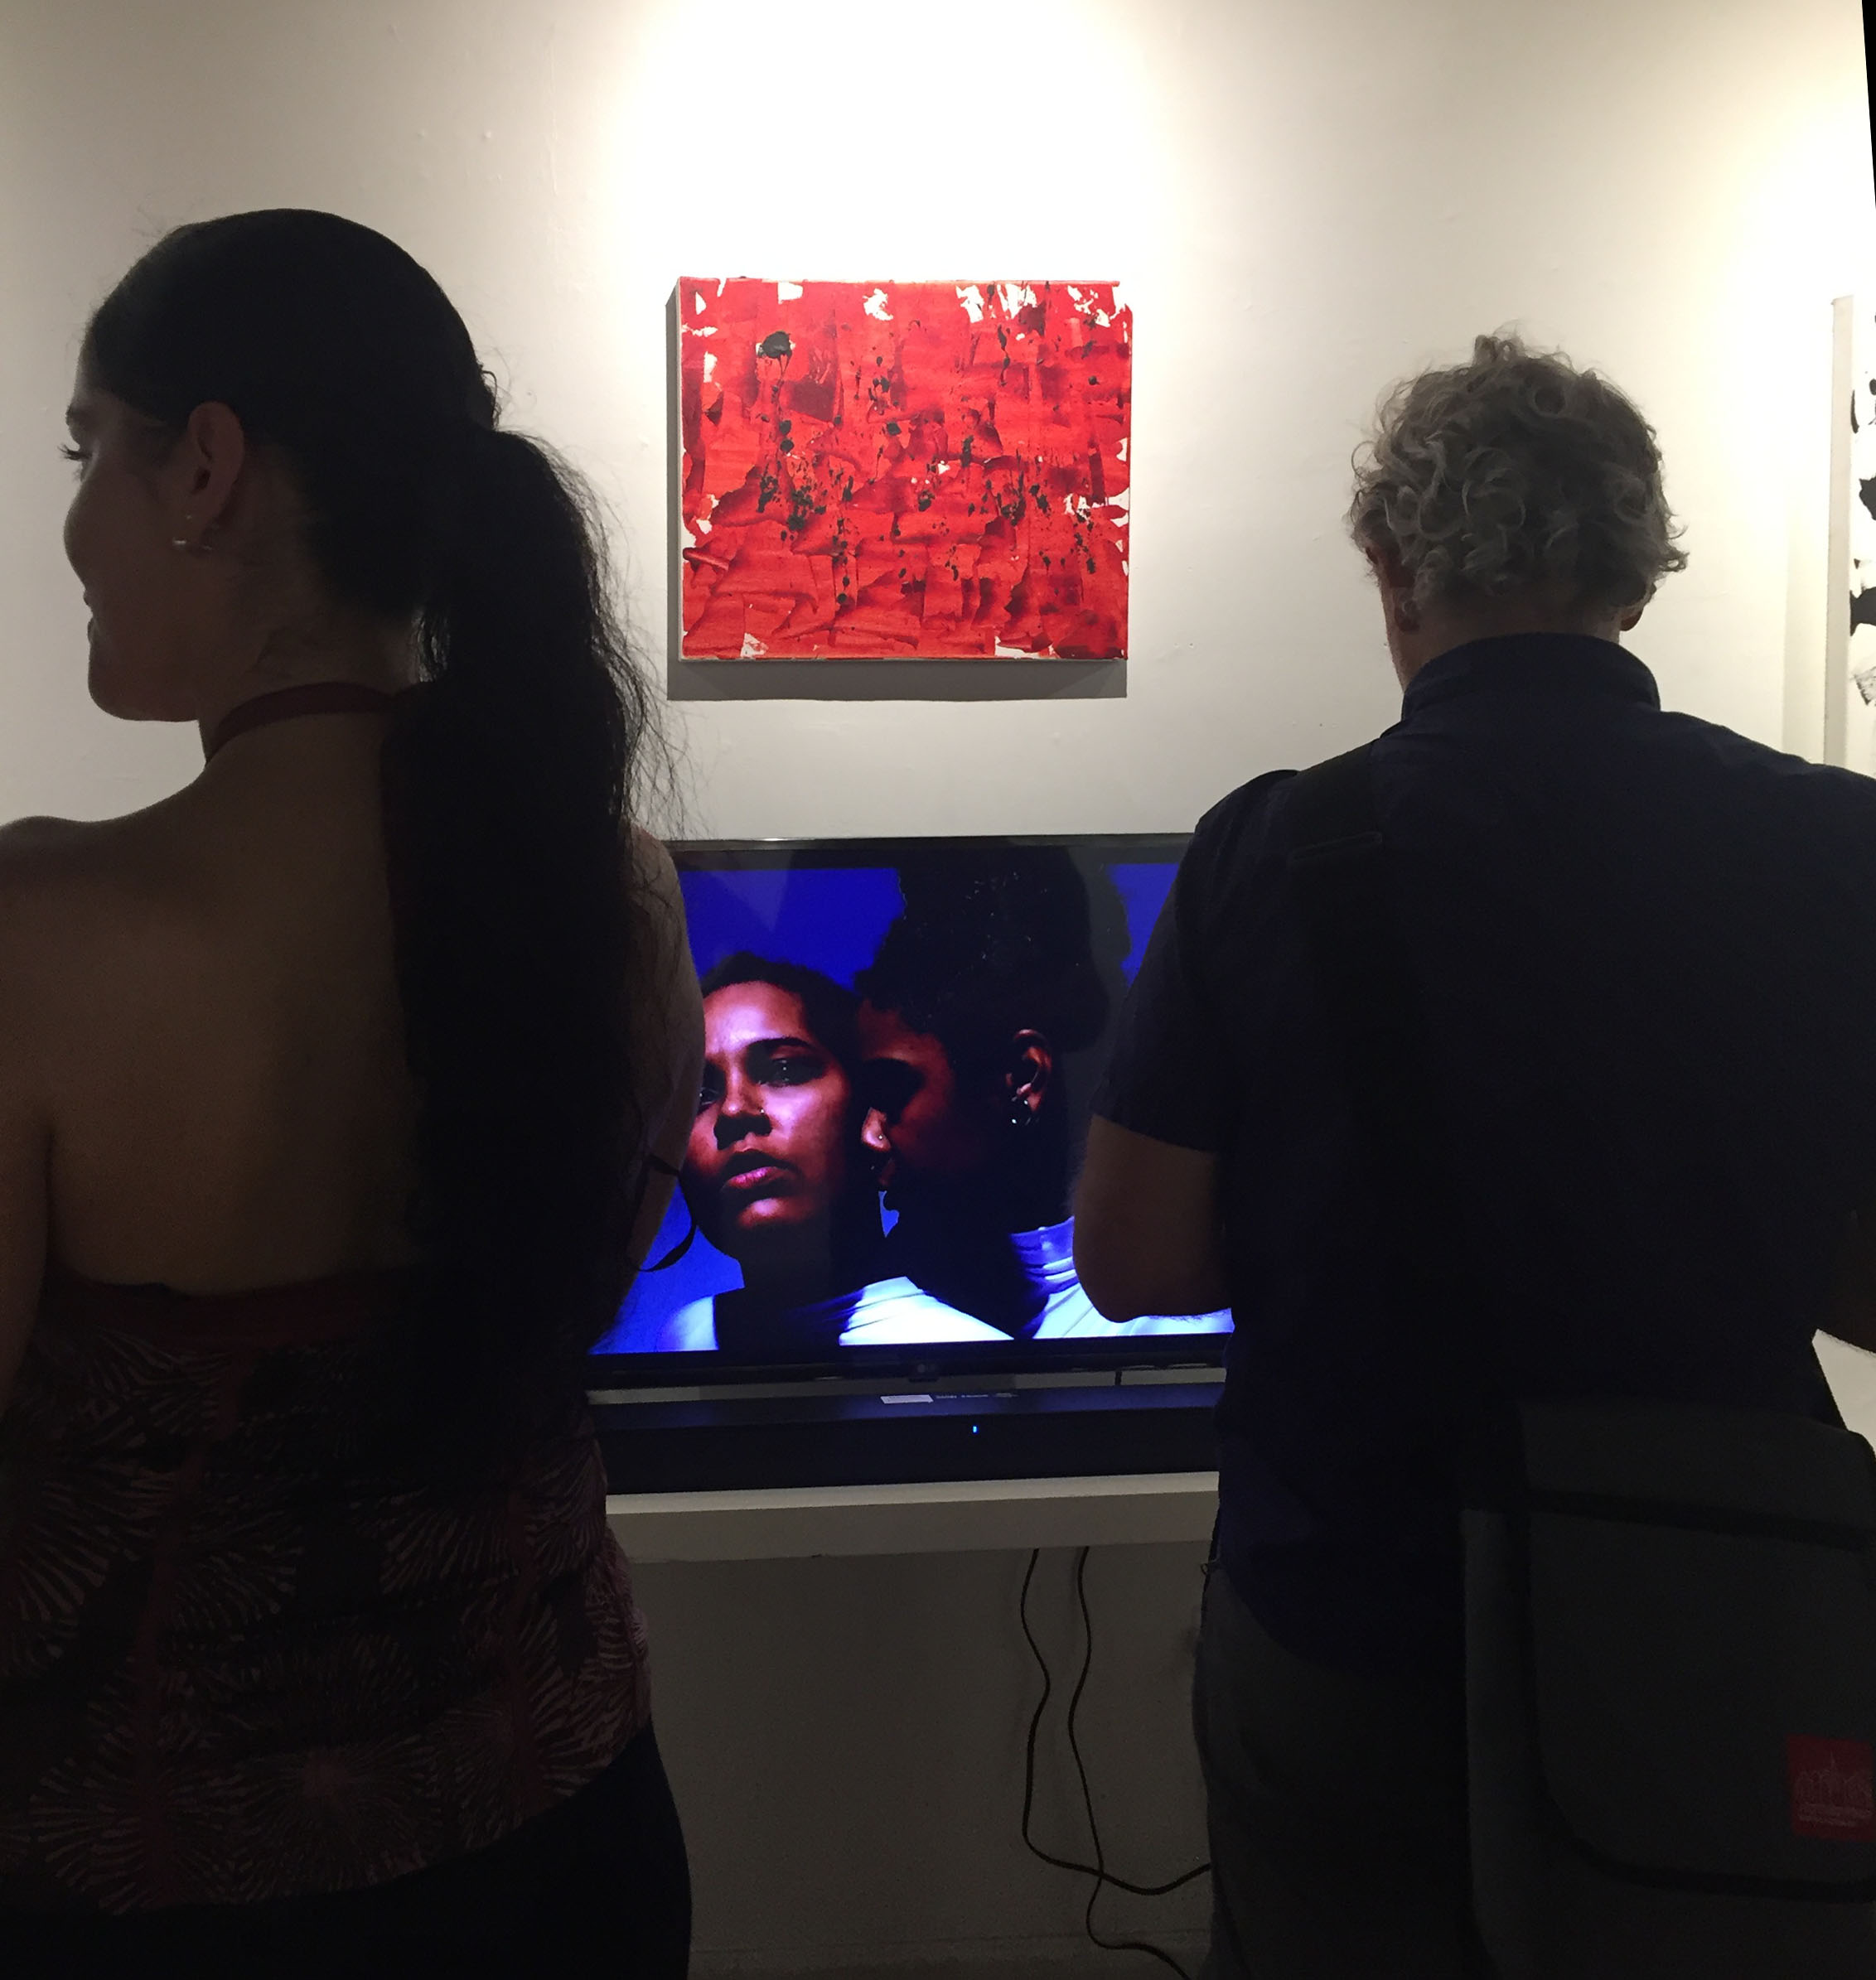 Bishop Gallery Video with Red Death Painting IMG_5349.jpg